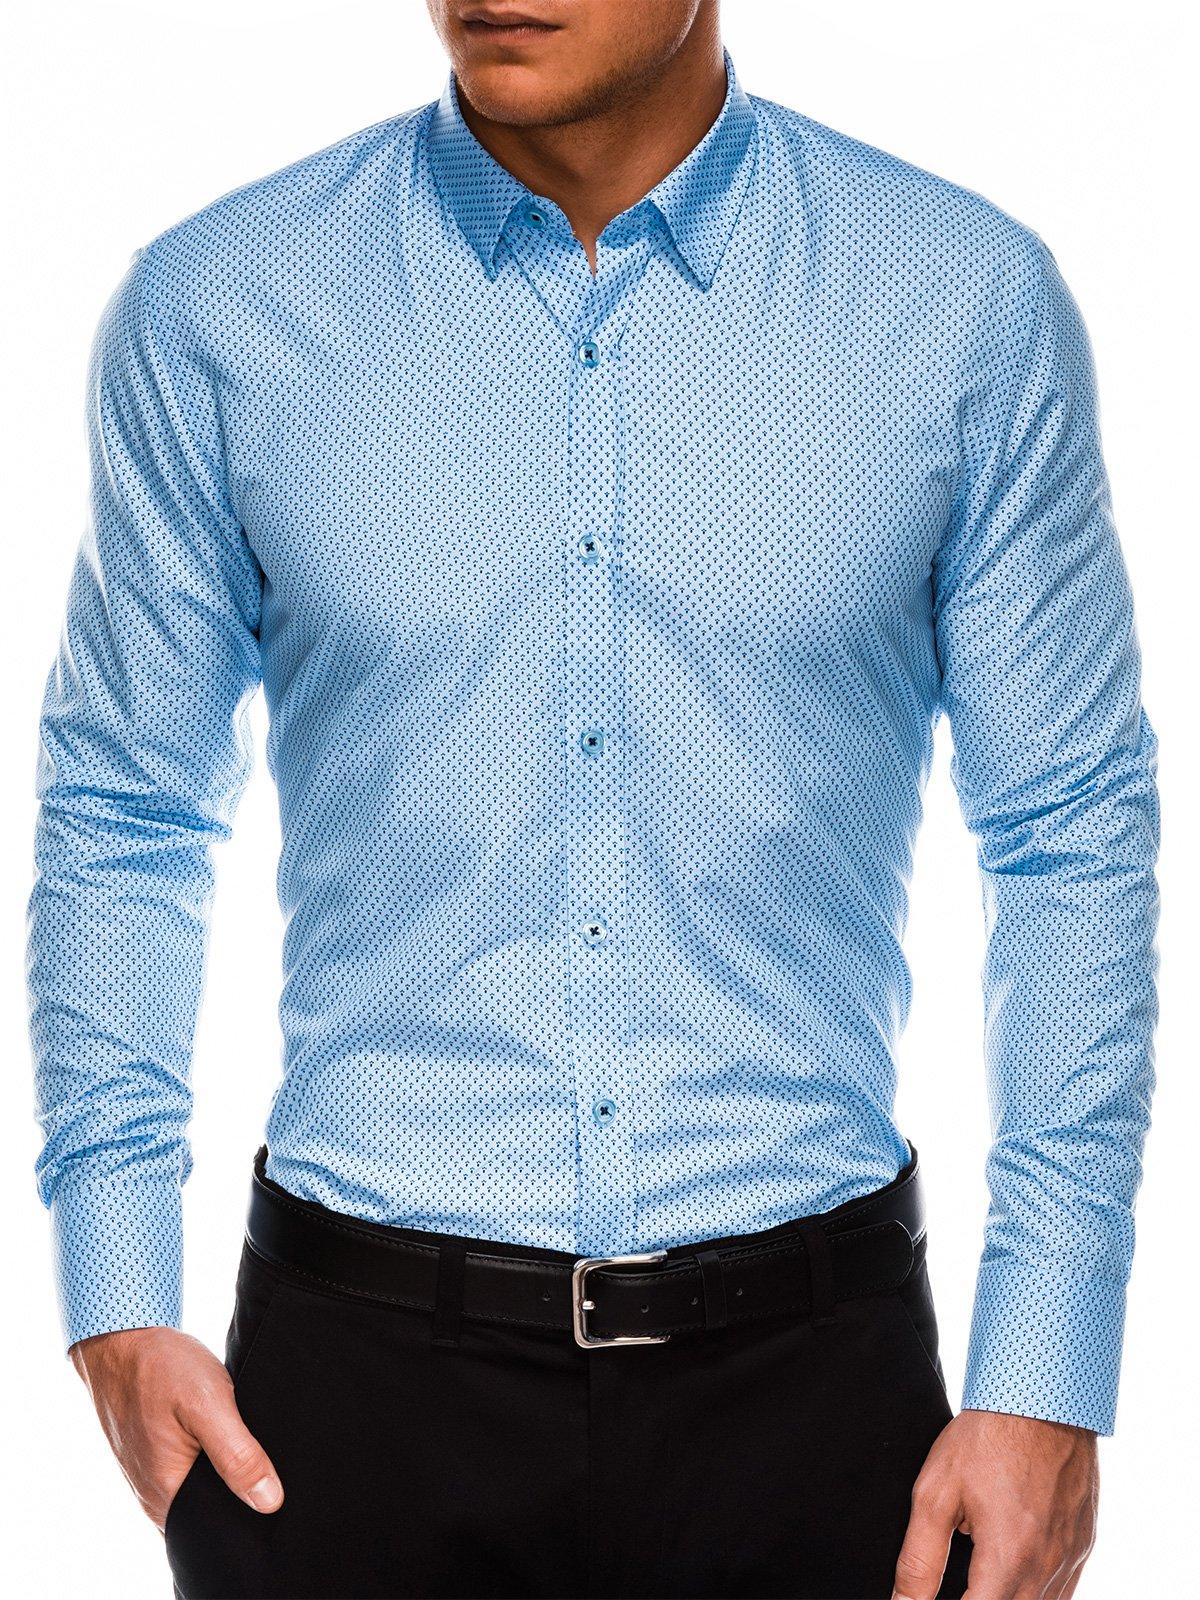 c0cff6d66845e9 Koszula męska elegancka z długim rękawem K479 - niebieska/granatowa ...